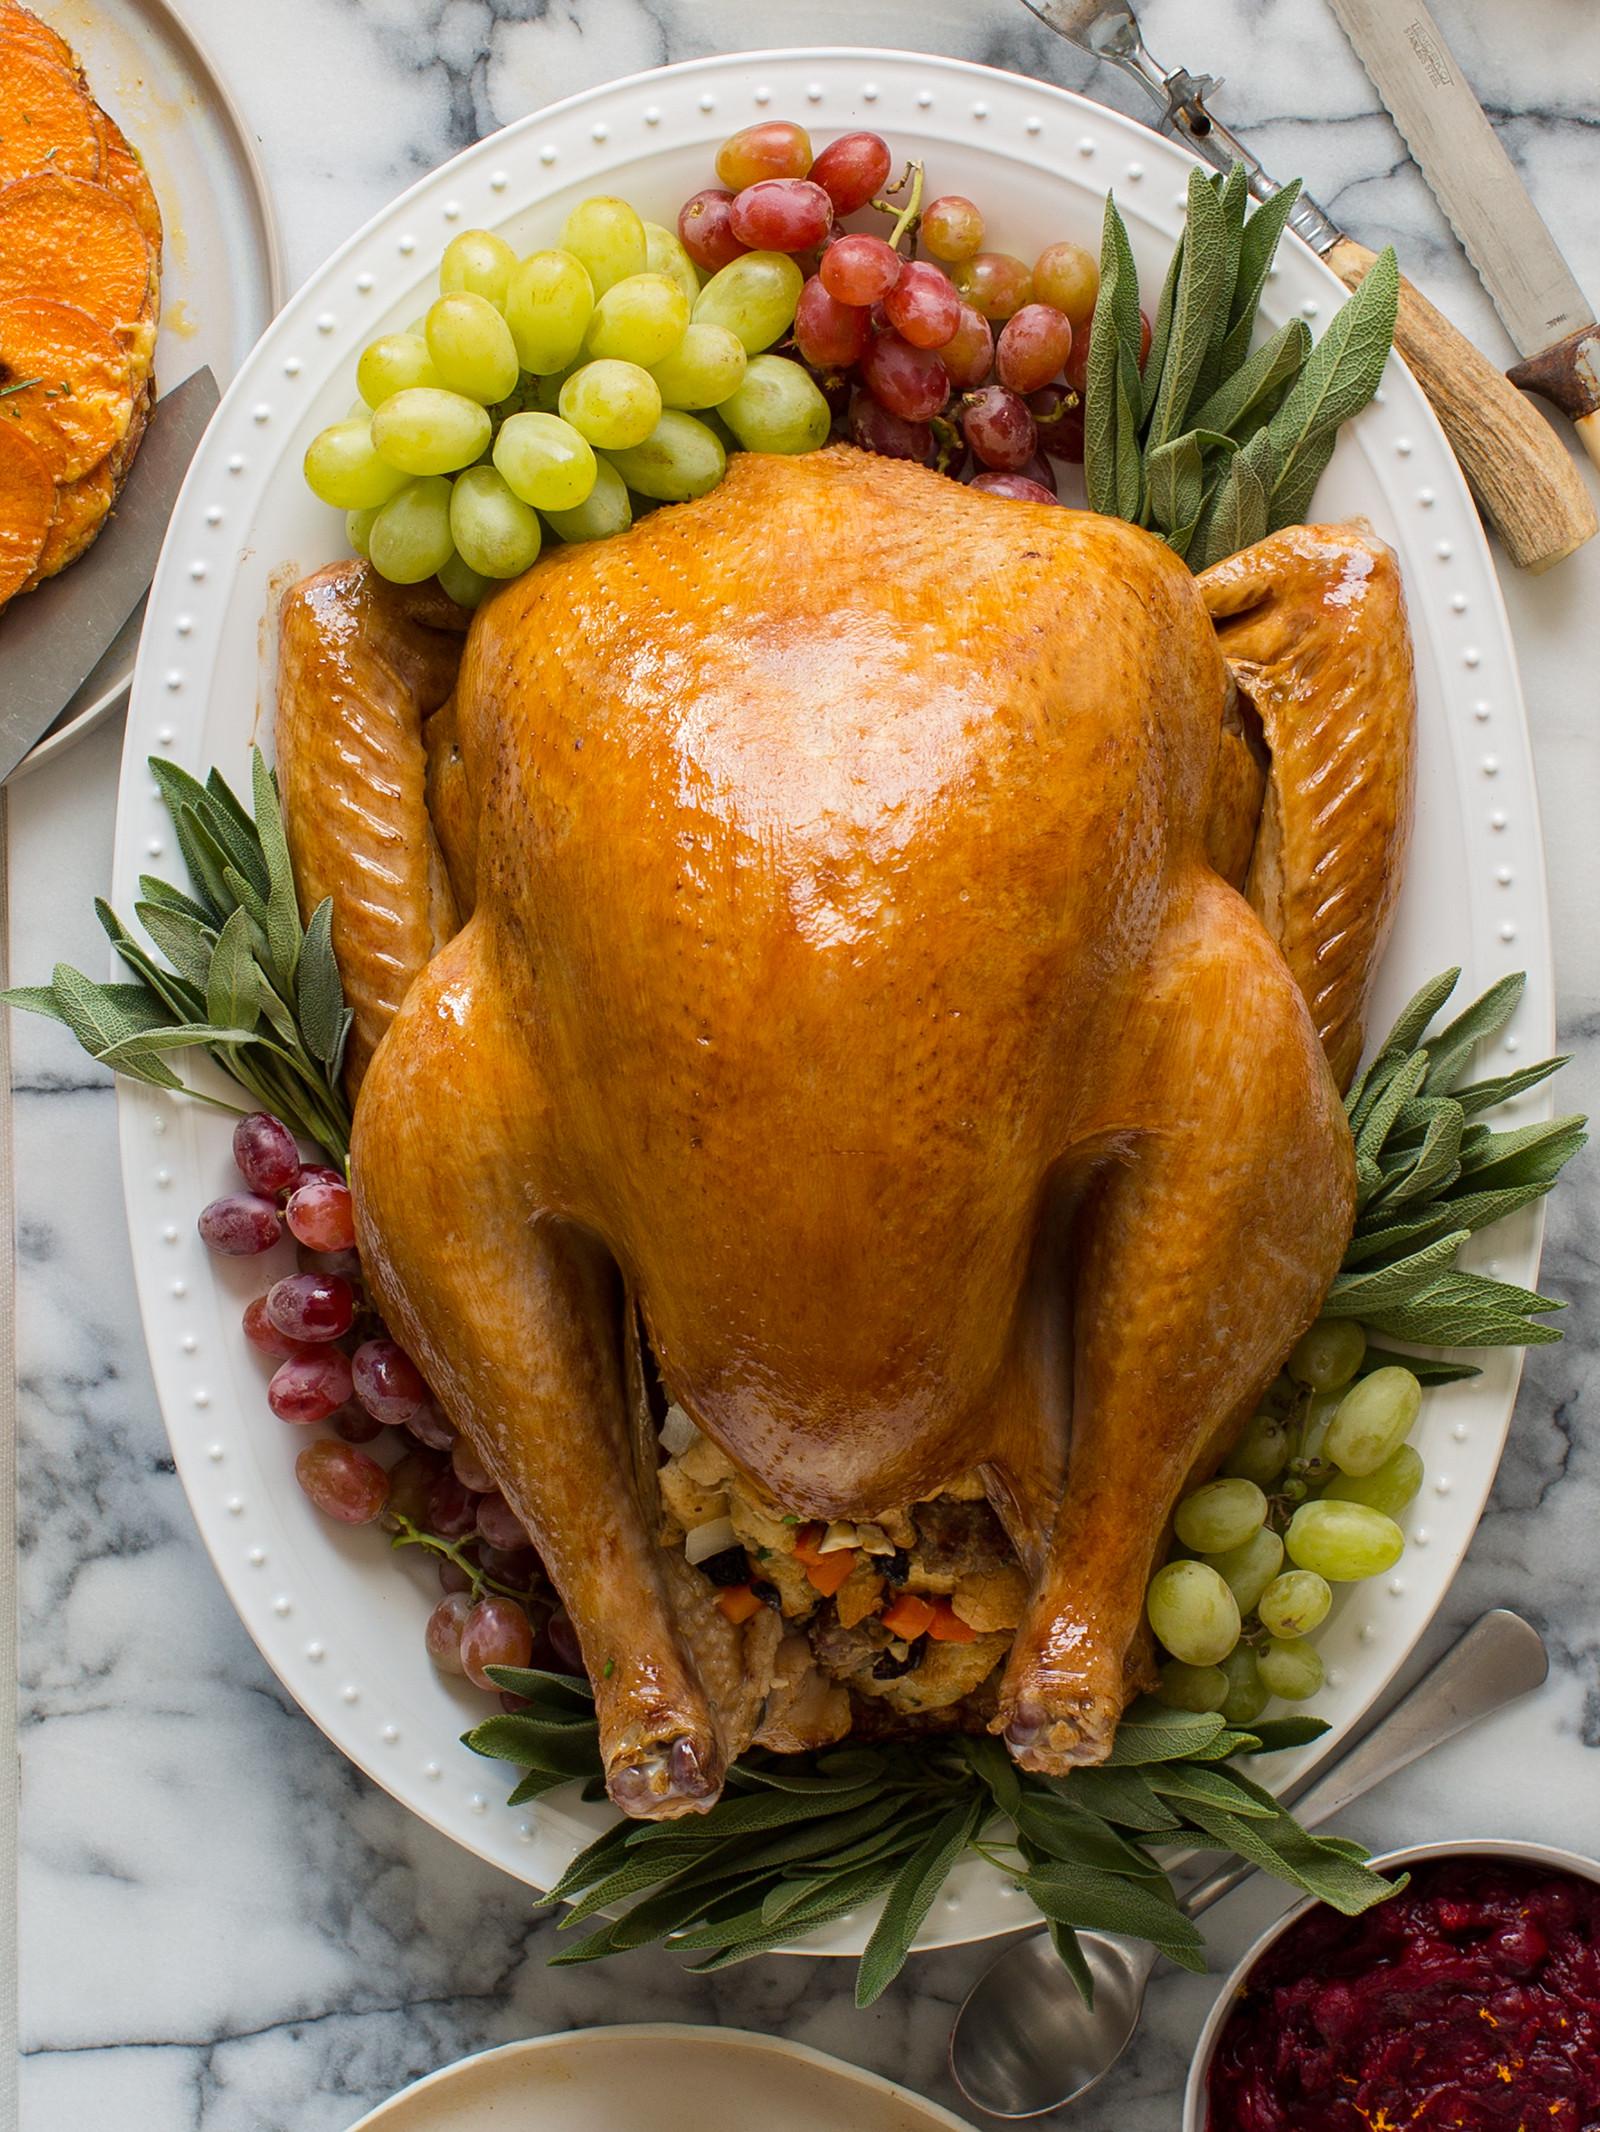 Thanksgiving Turkey Image  Citrus and Herb Roasted Turkey Thanksgiving